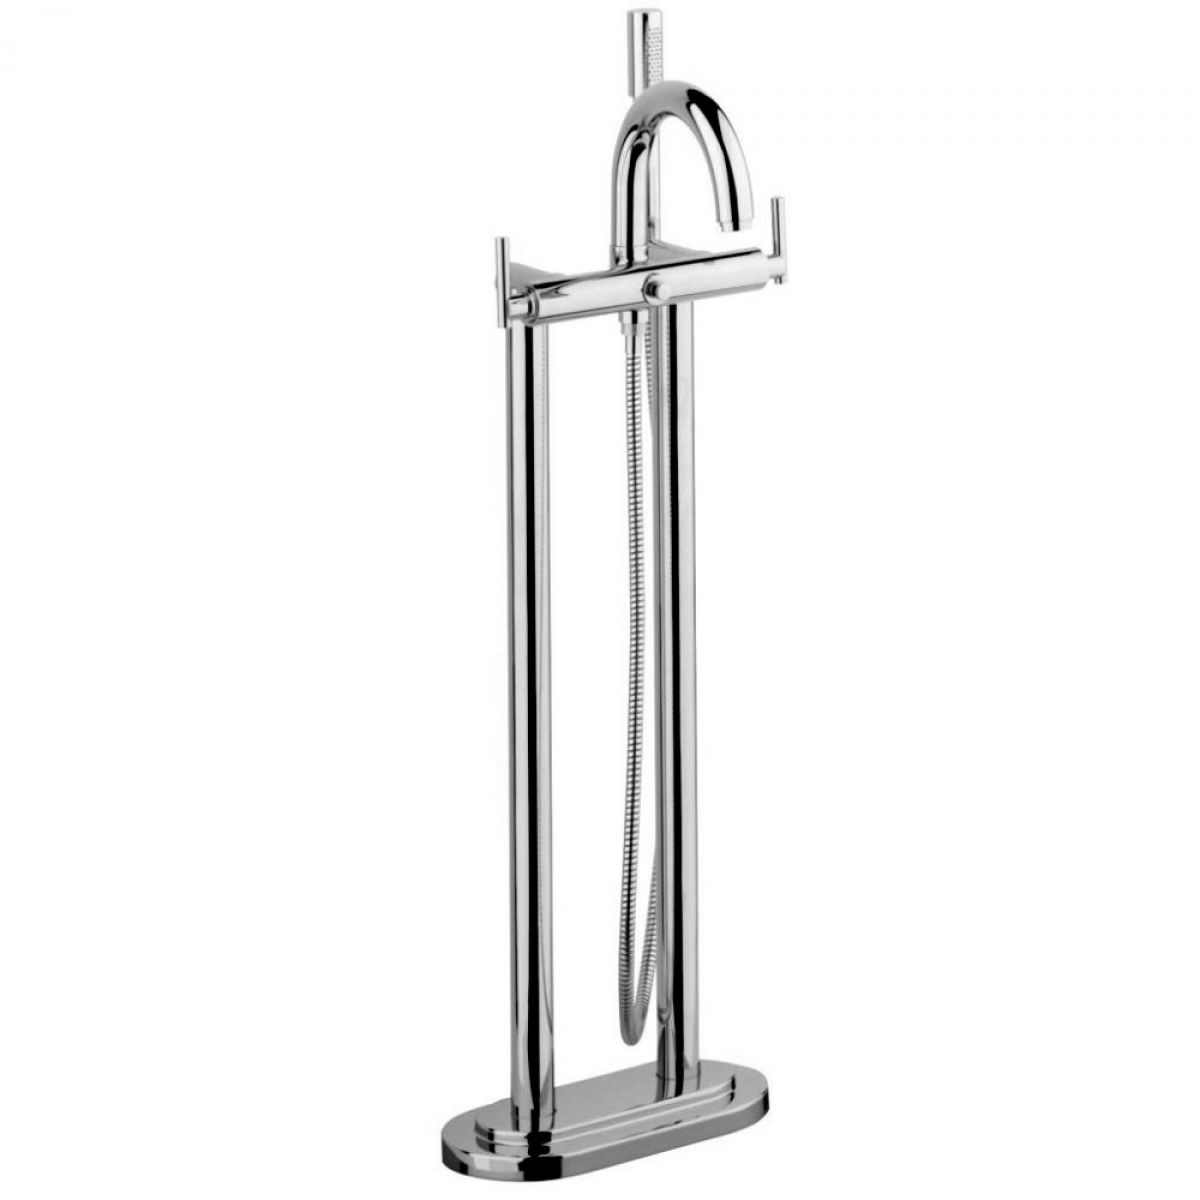 grohe atrio jota floor mounted bath shower mixer uk. Black Bedroom Furniture Sets. Home Design Ideas